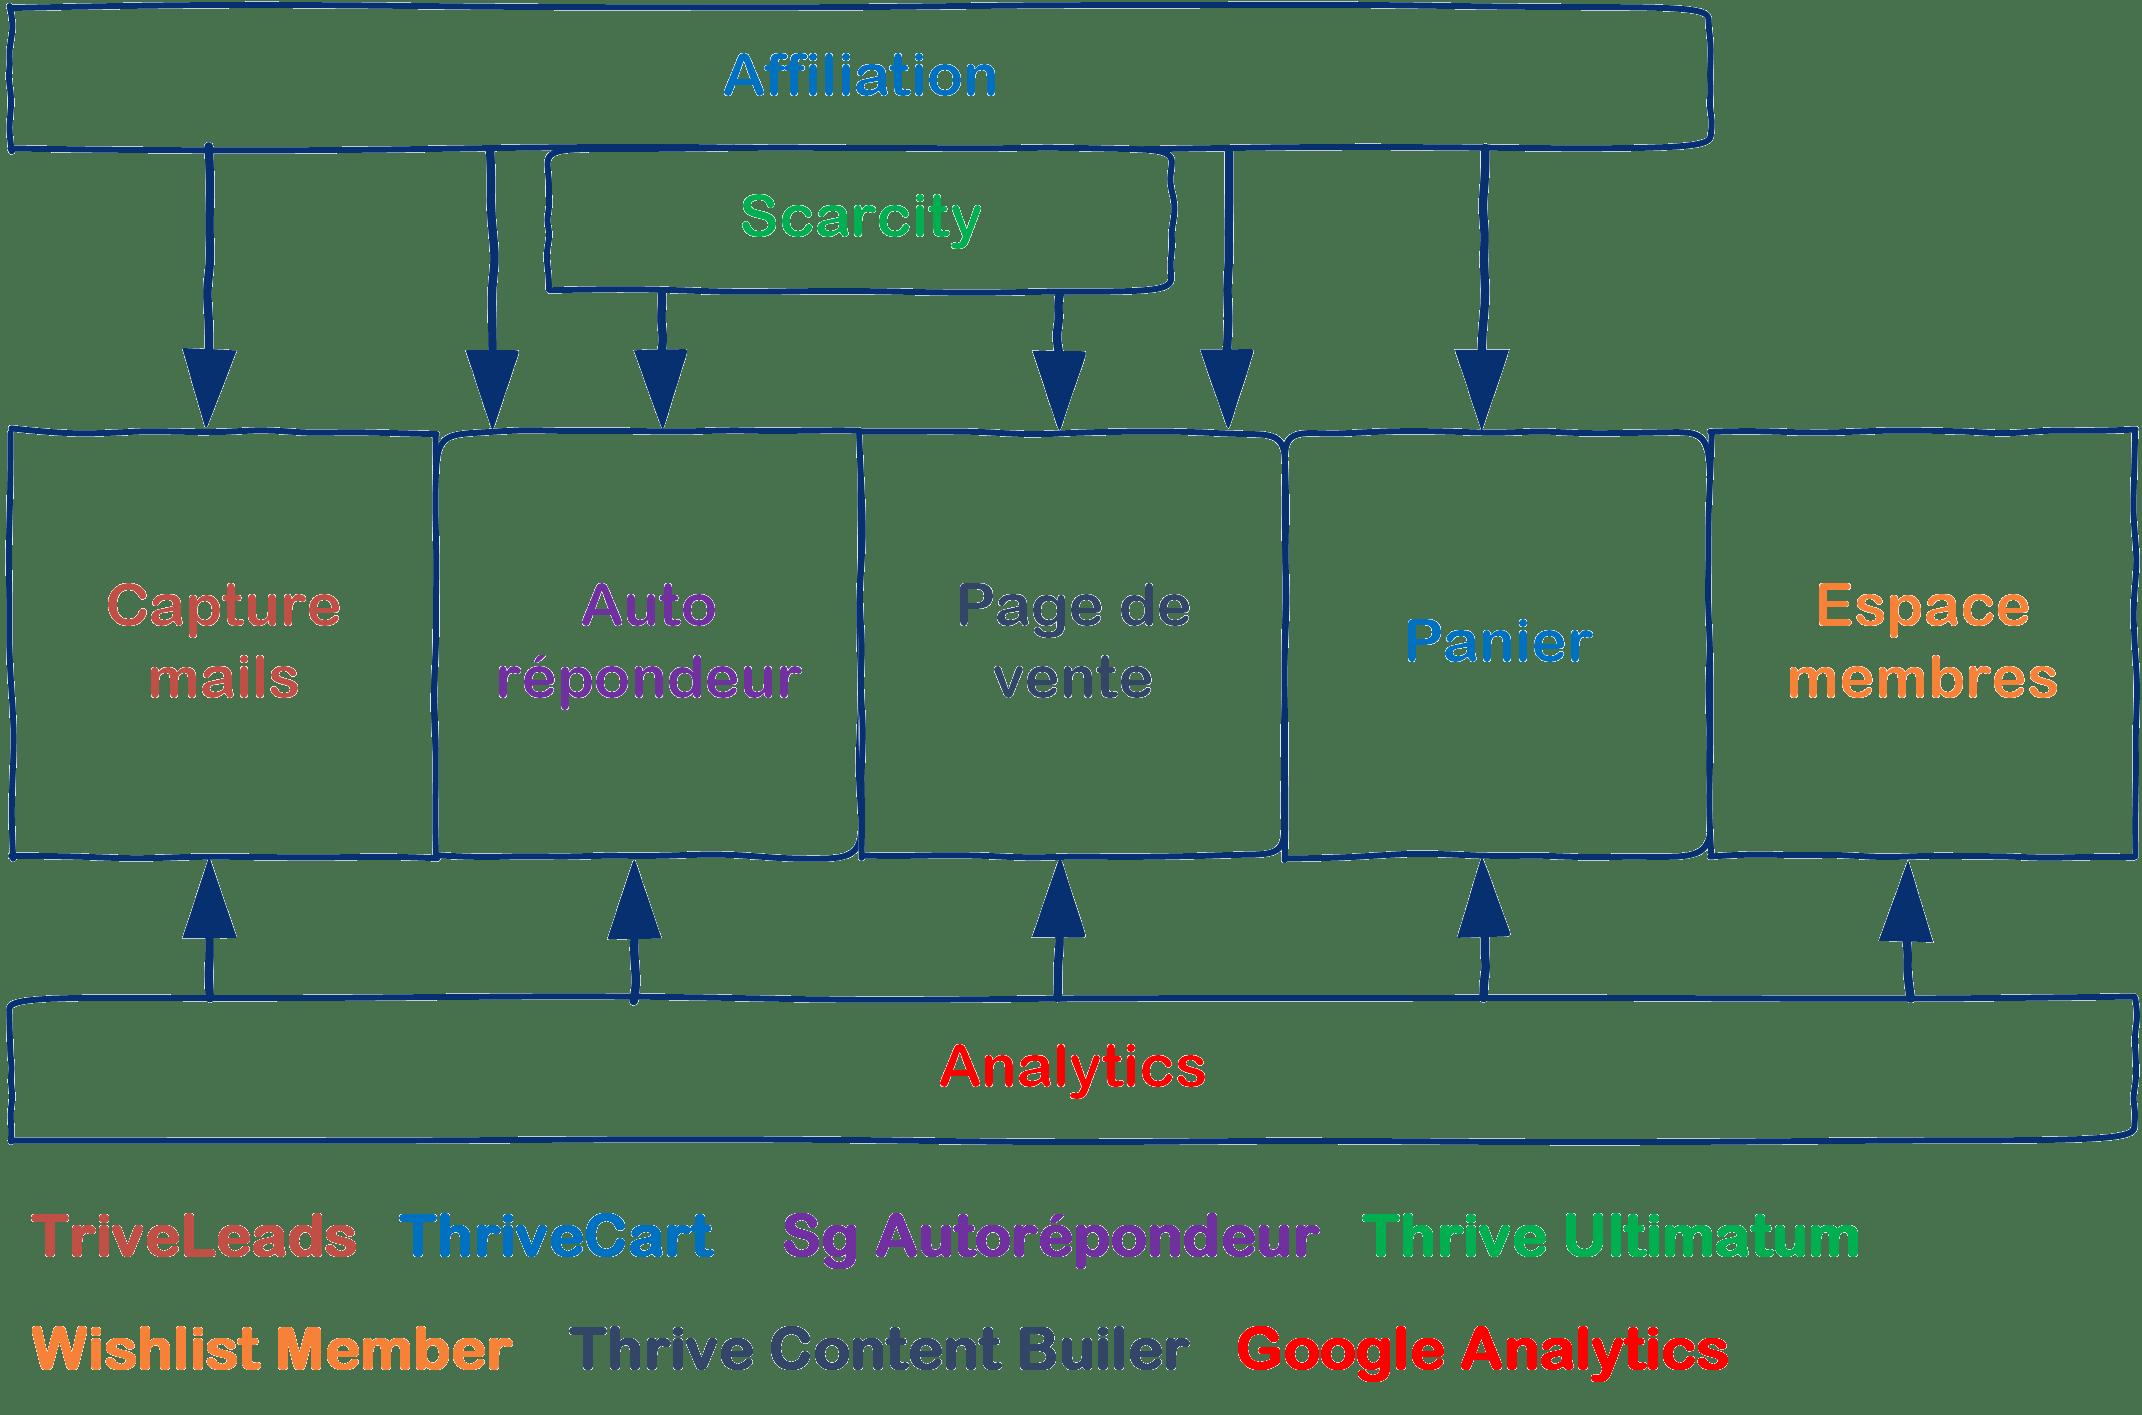 schéma logiciels licence marekting tunnels de vente